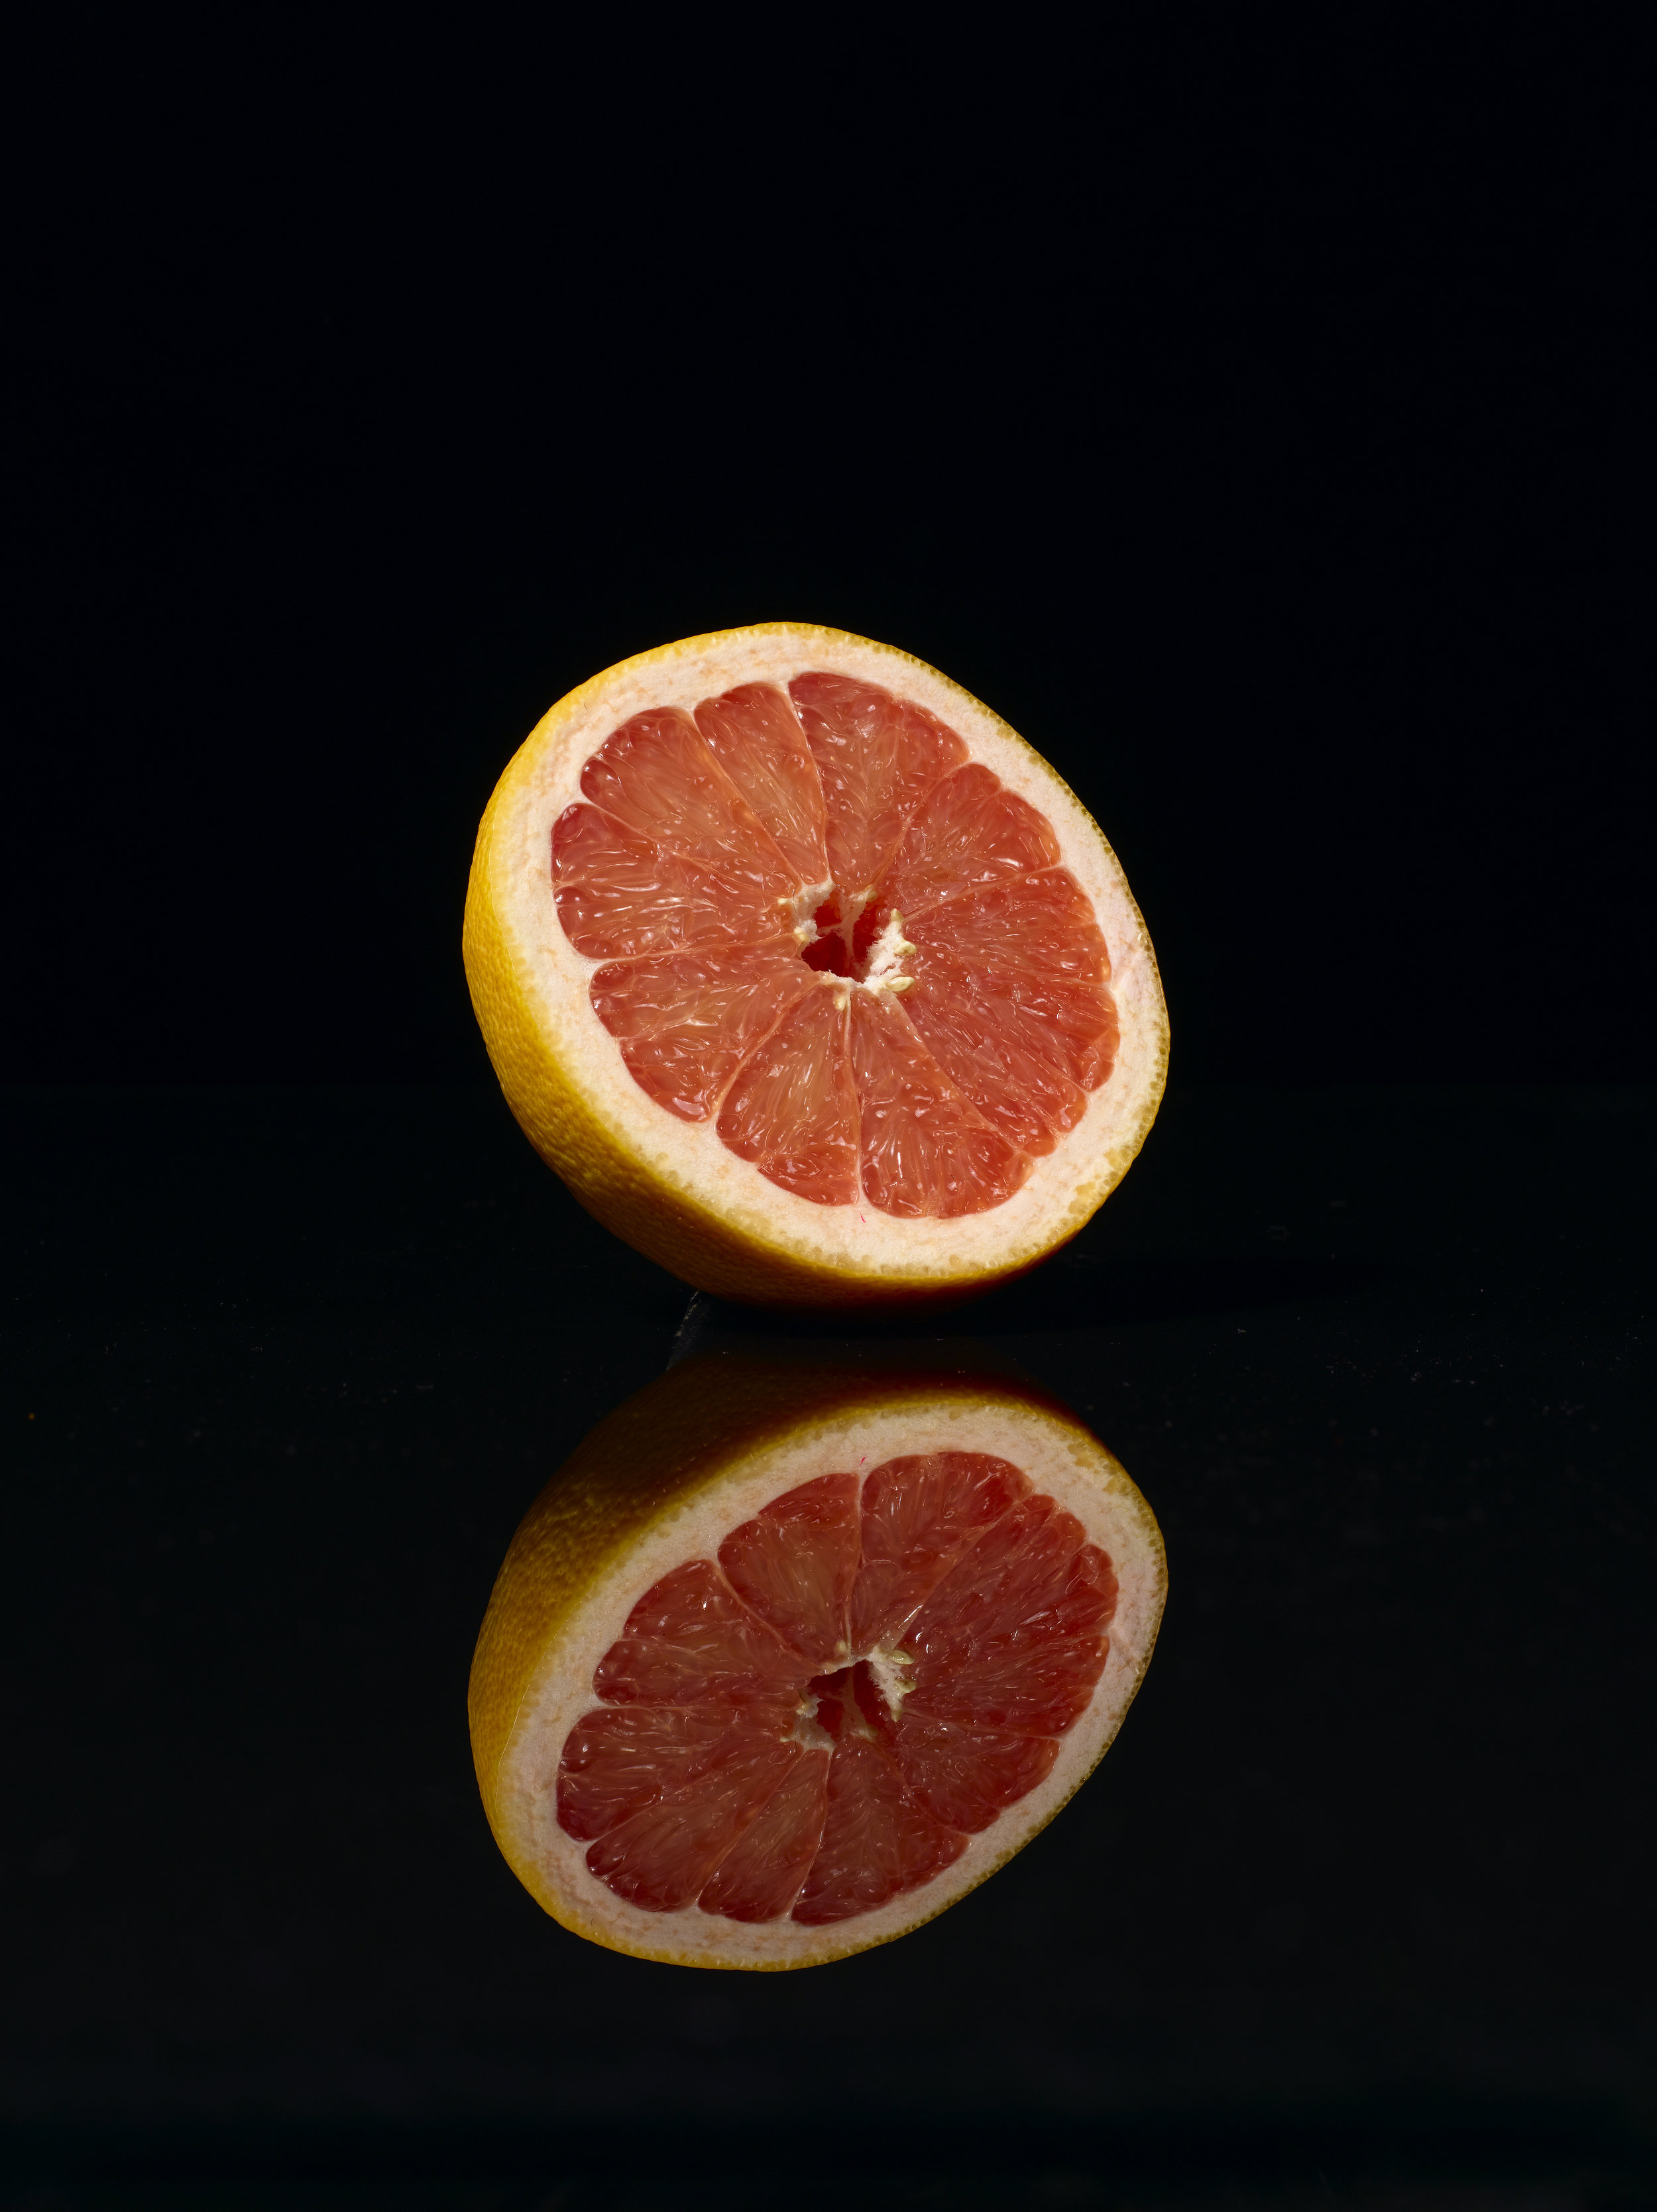 13_04_01_LO_B_grapefruit_042.jpg